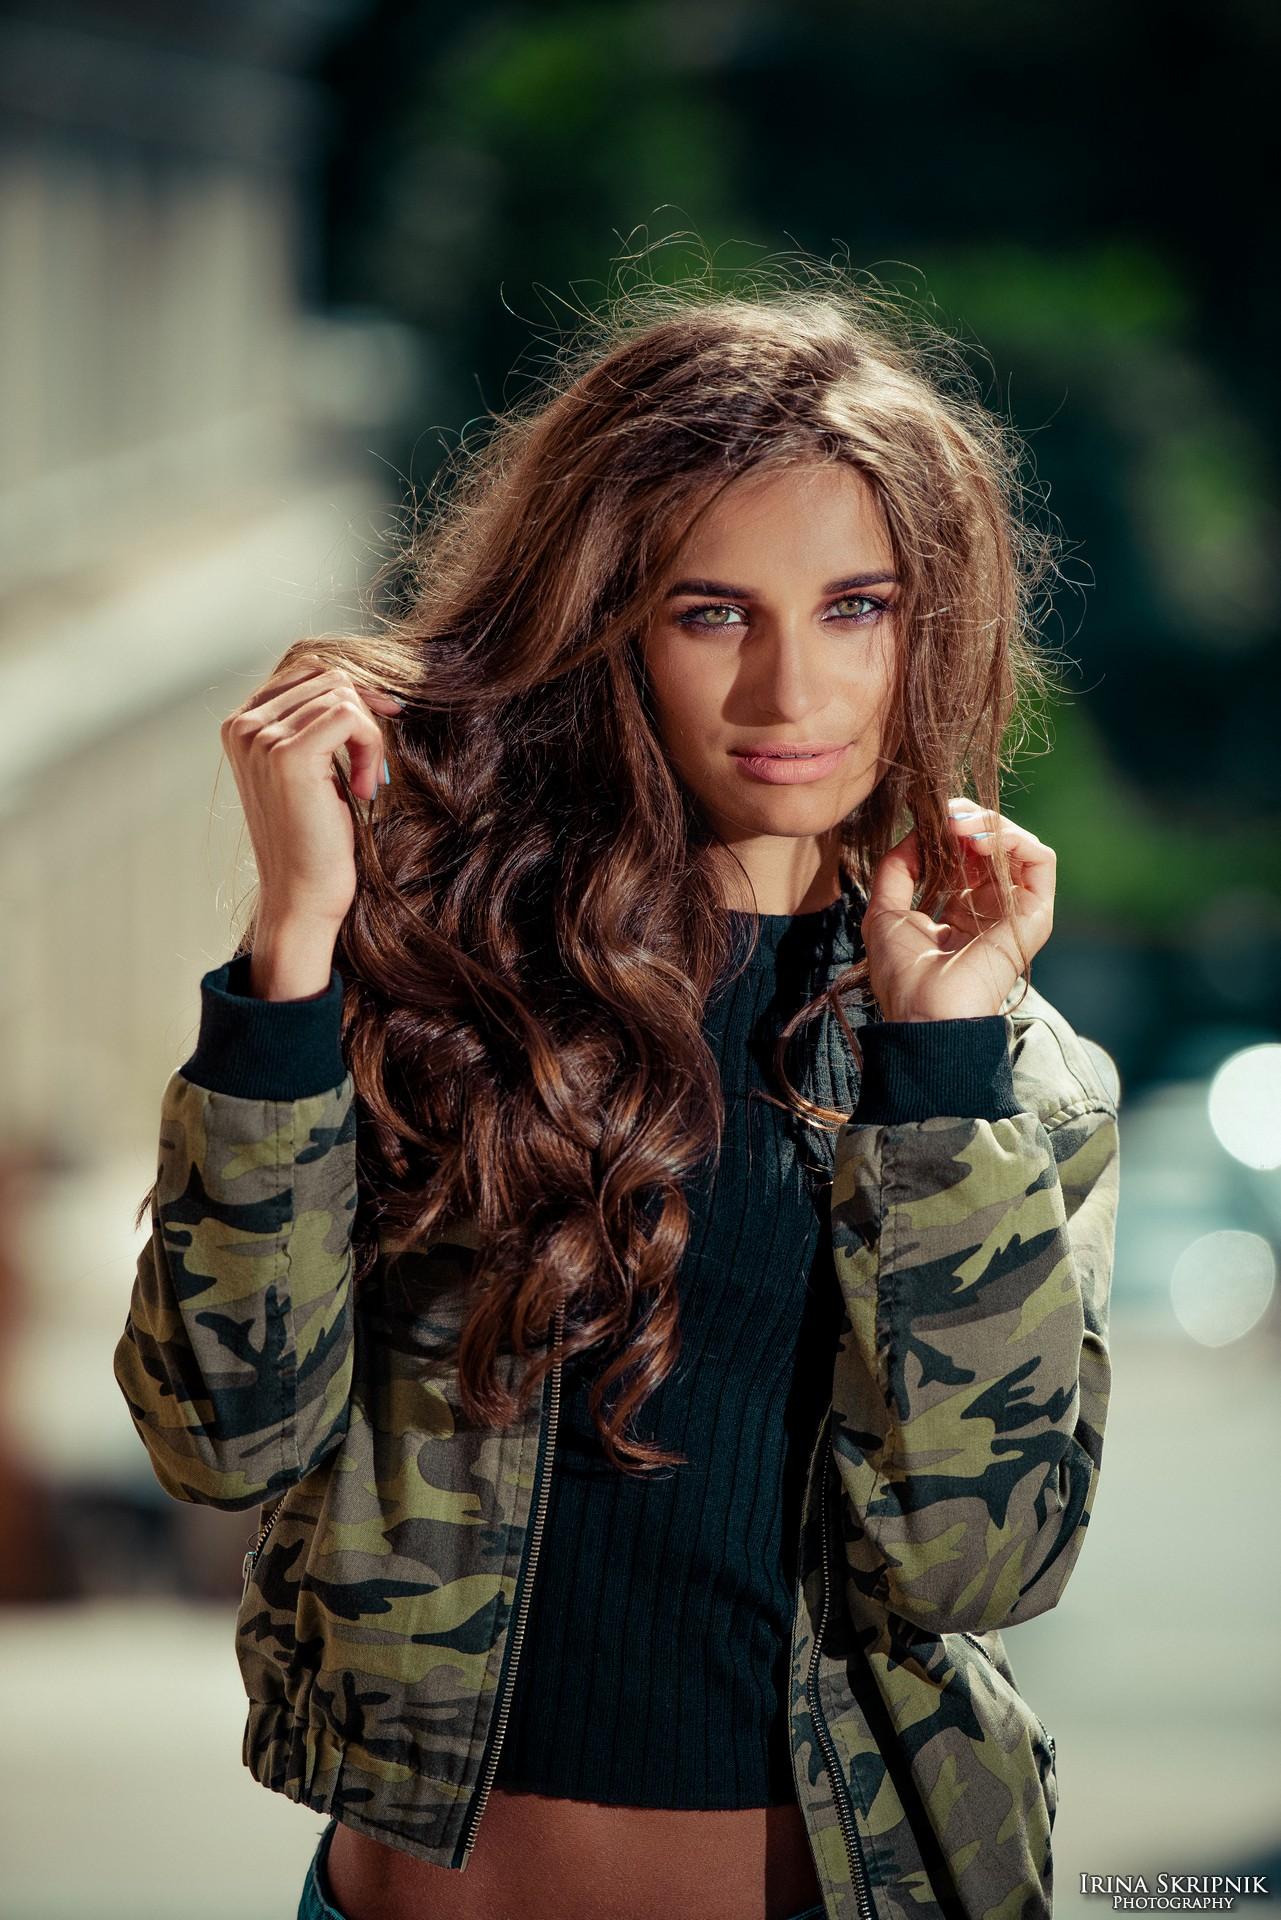 Irina Skripnik Photography 30062